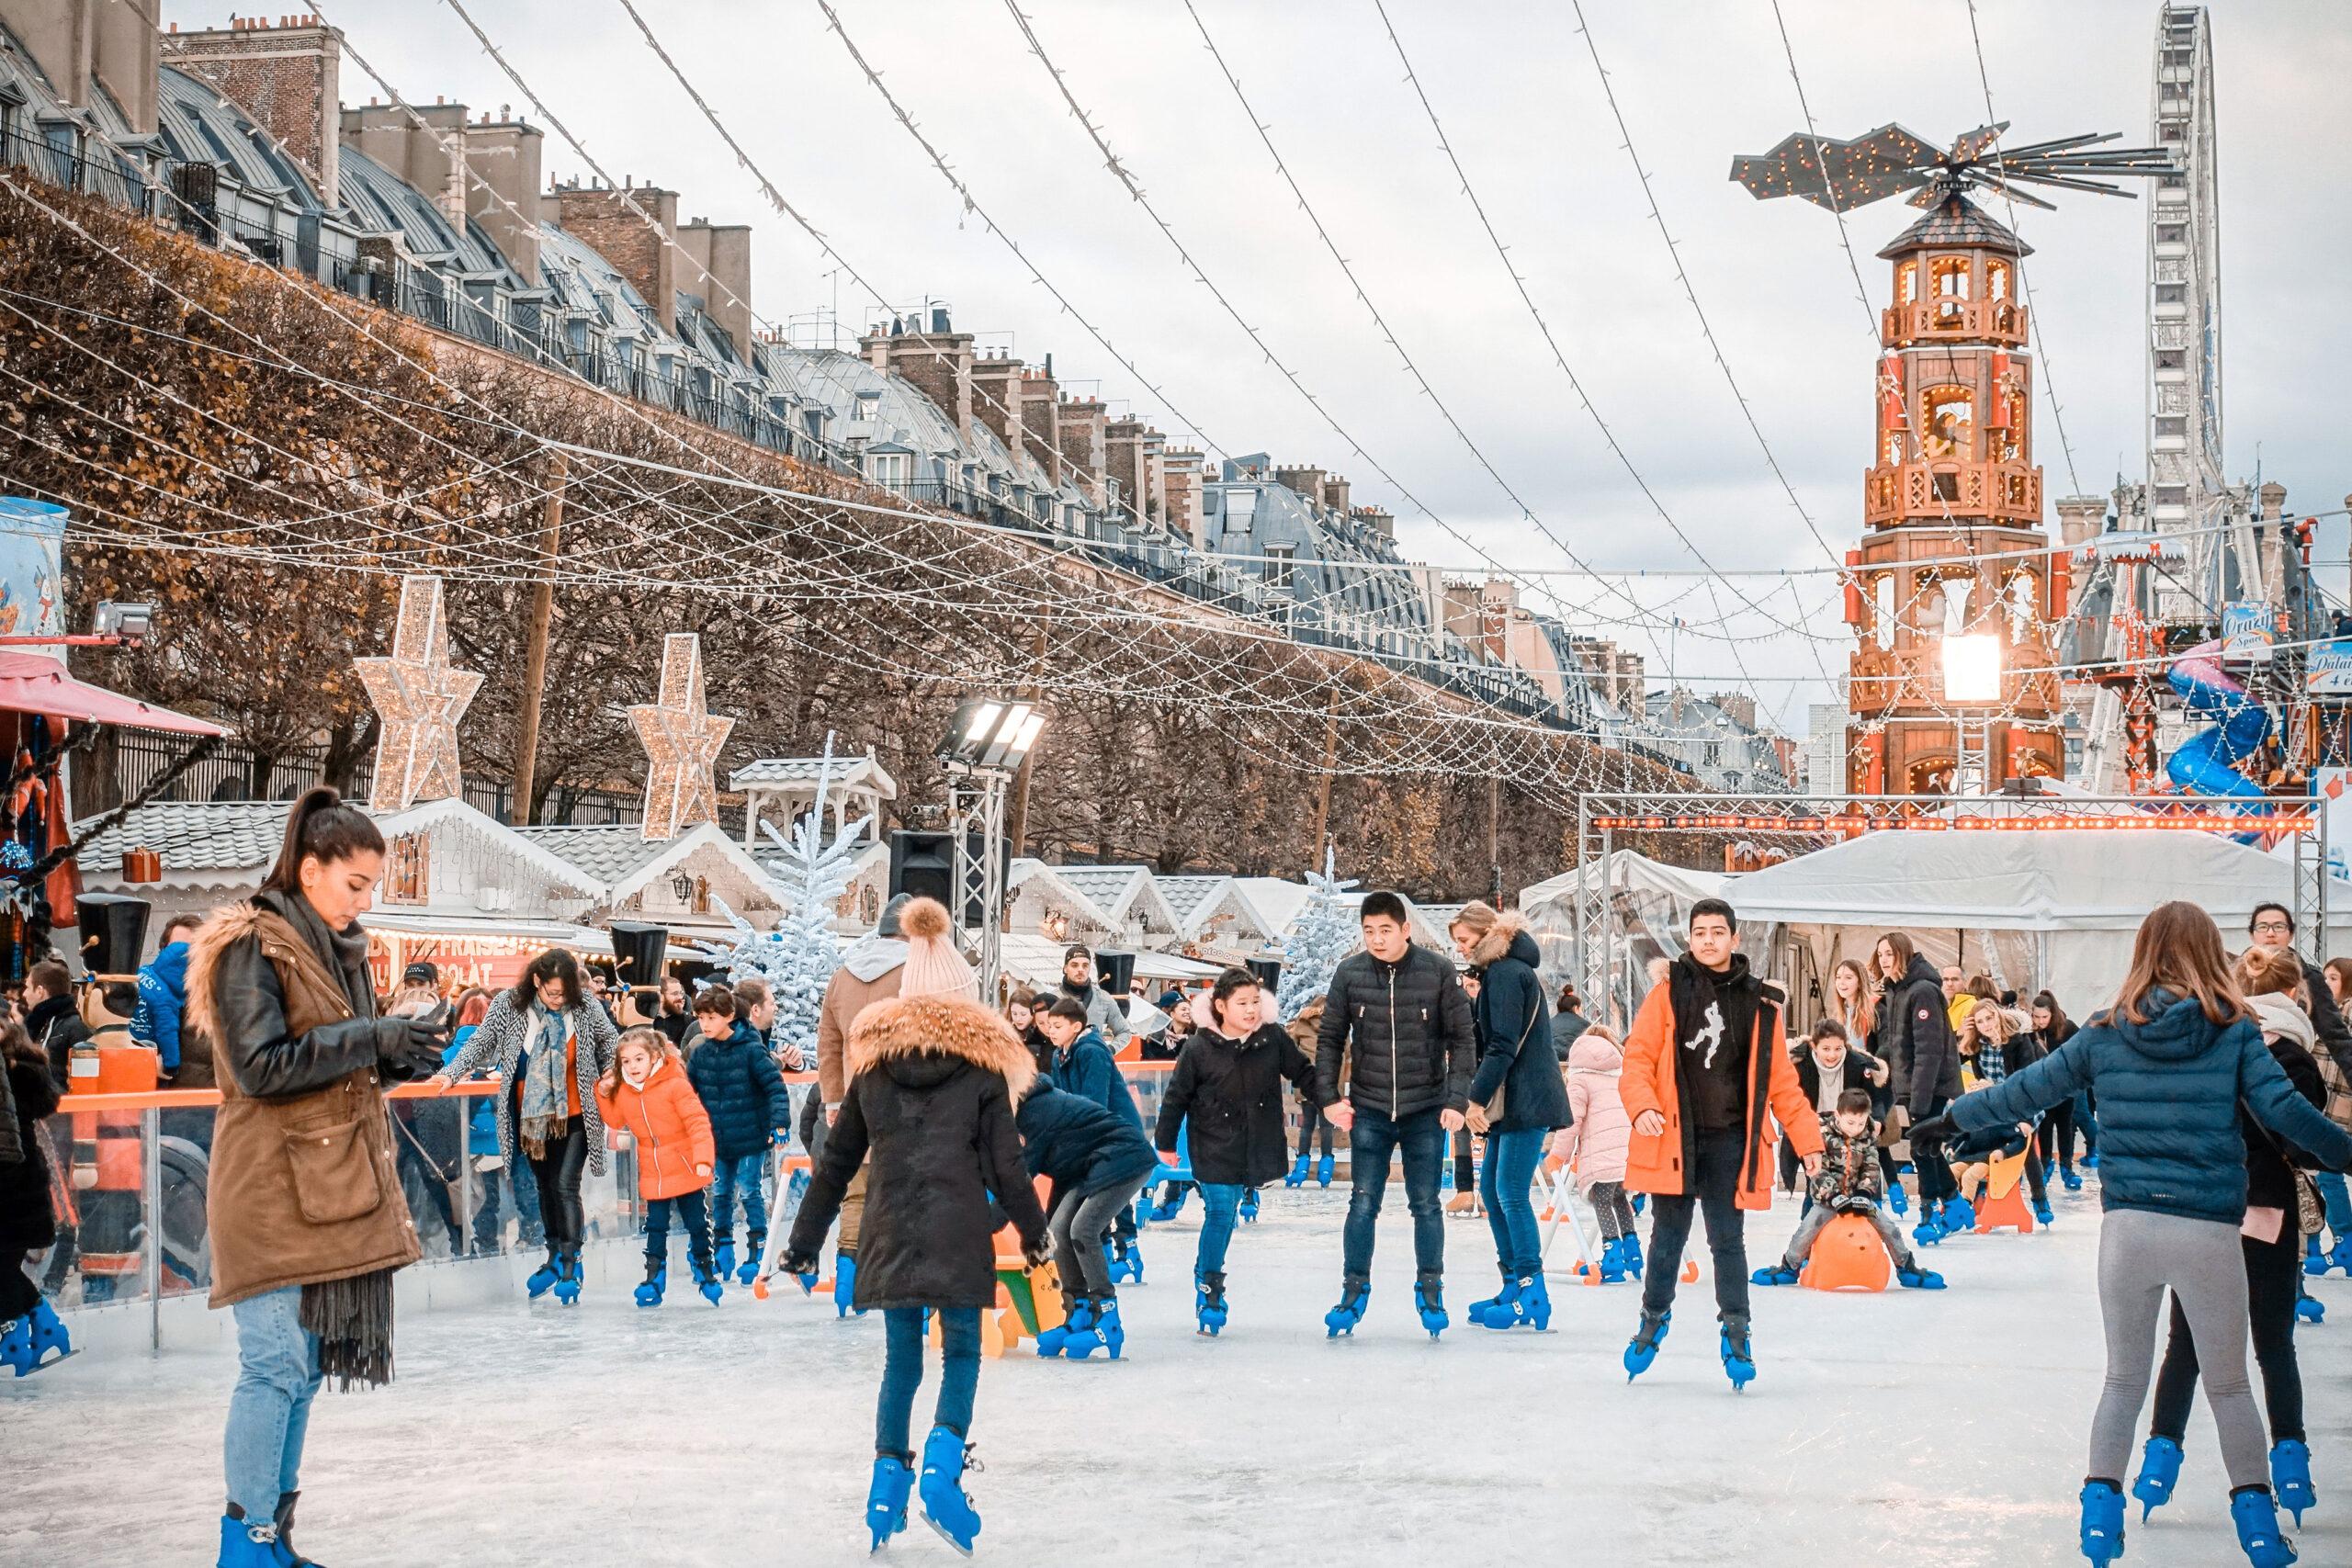 julemarked julefeiring Paris Frankrike jul hoytid